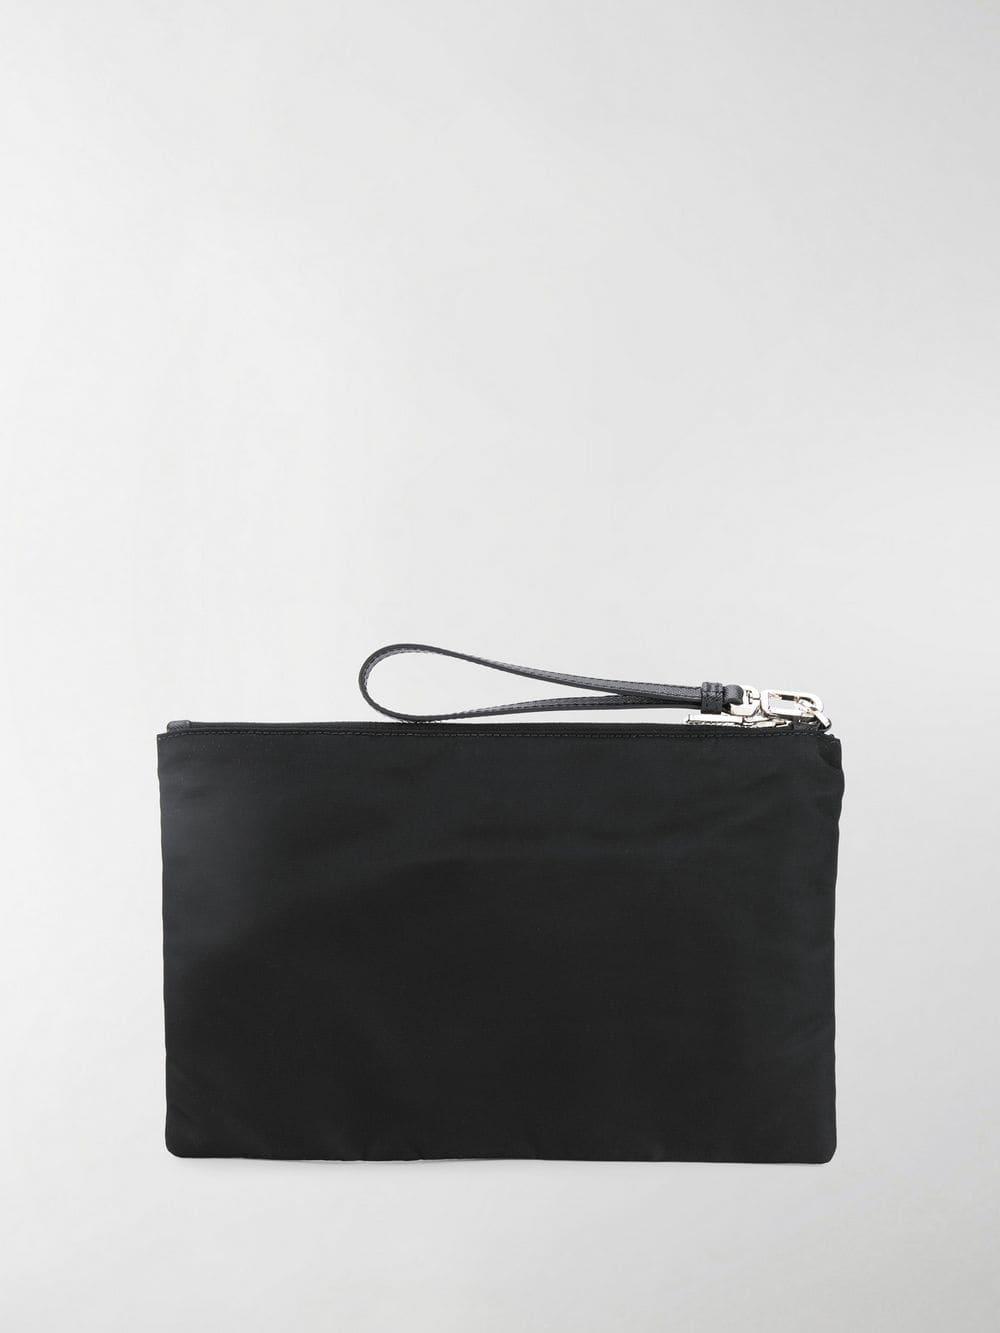 Lyst - Prada Vela Clutch Bag in Black for Men 3f01f3b2c1890